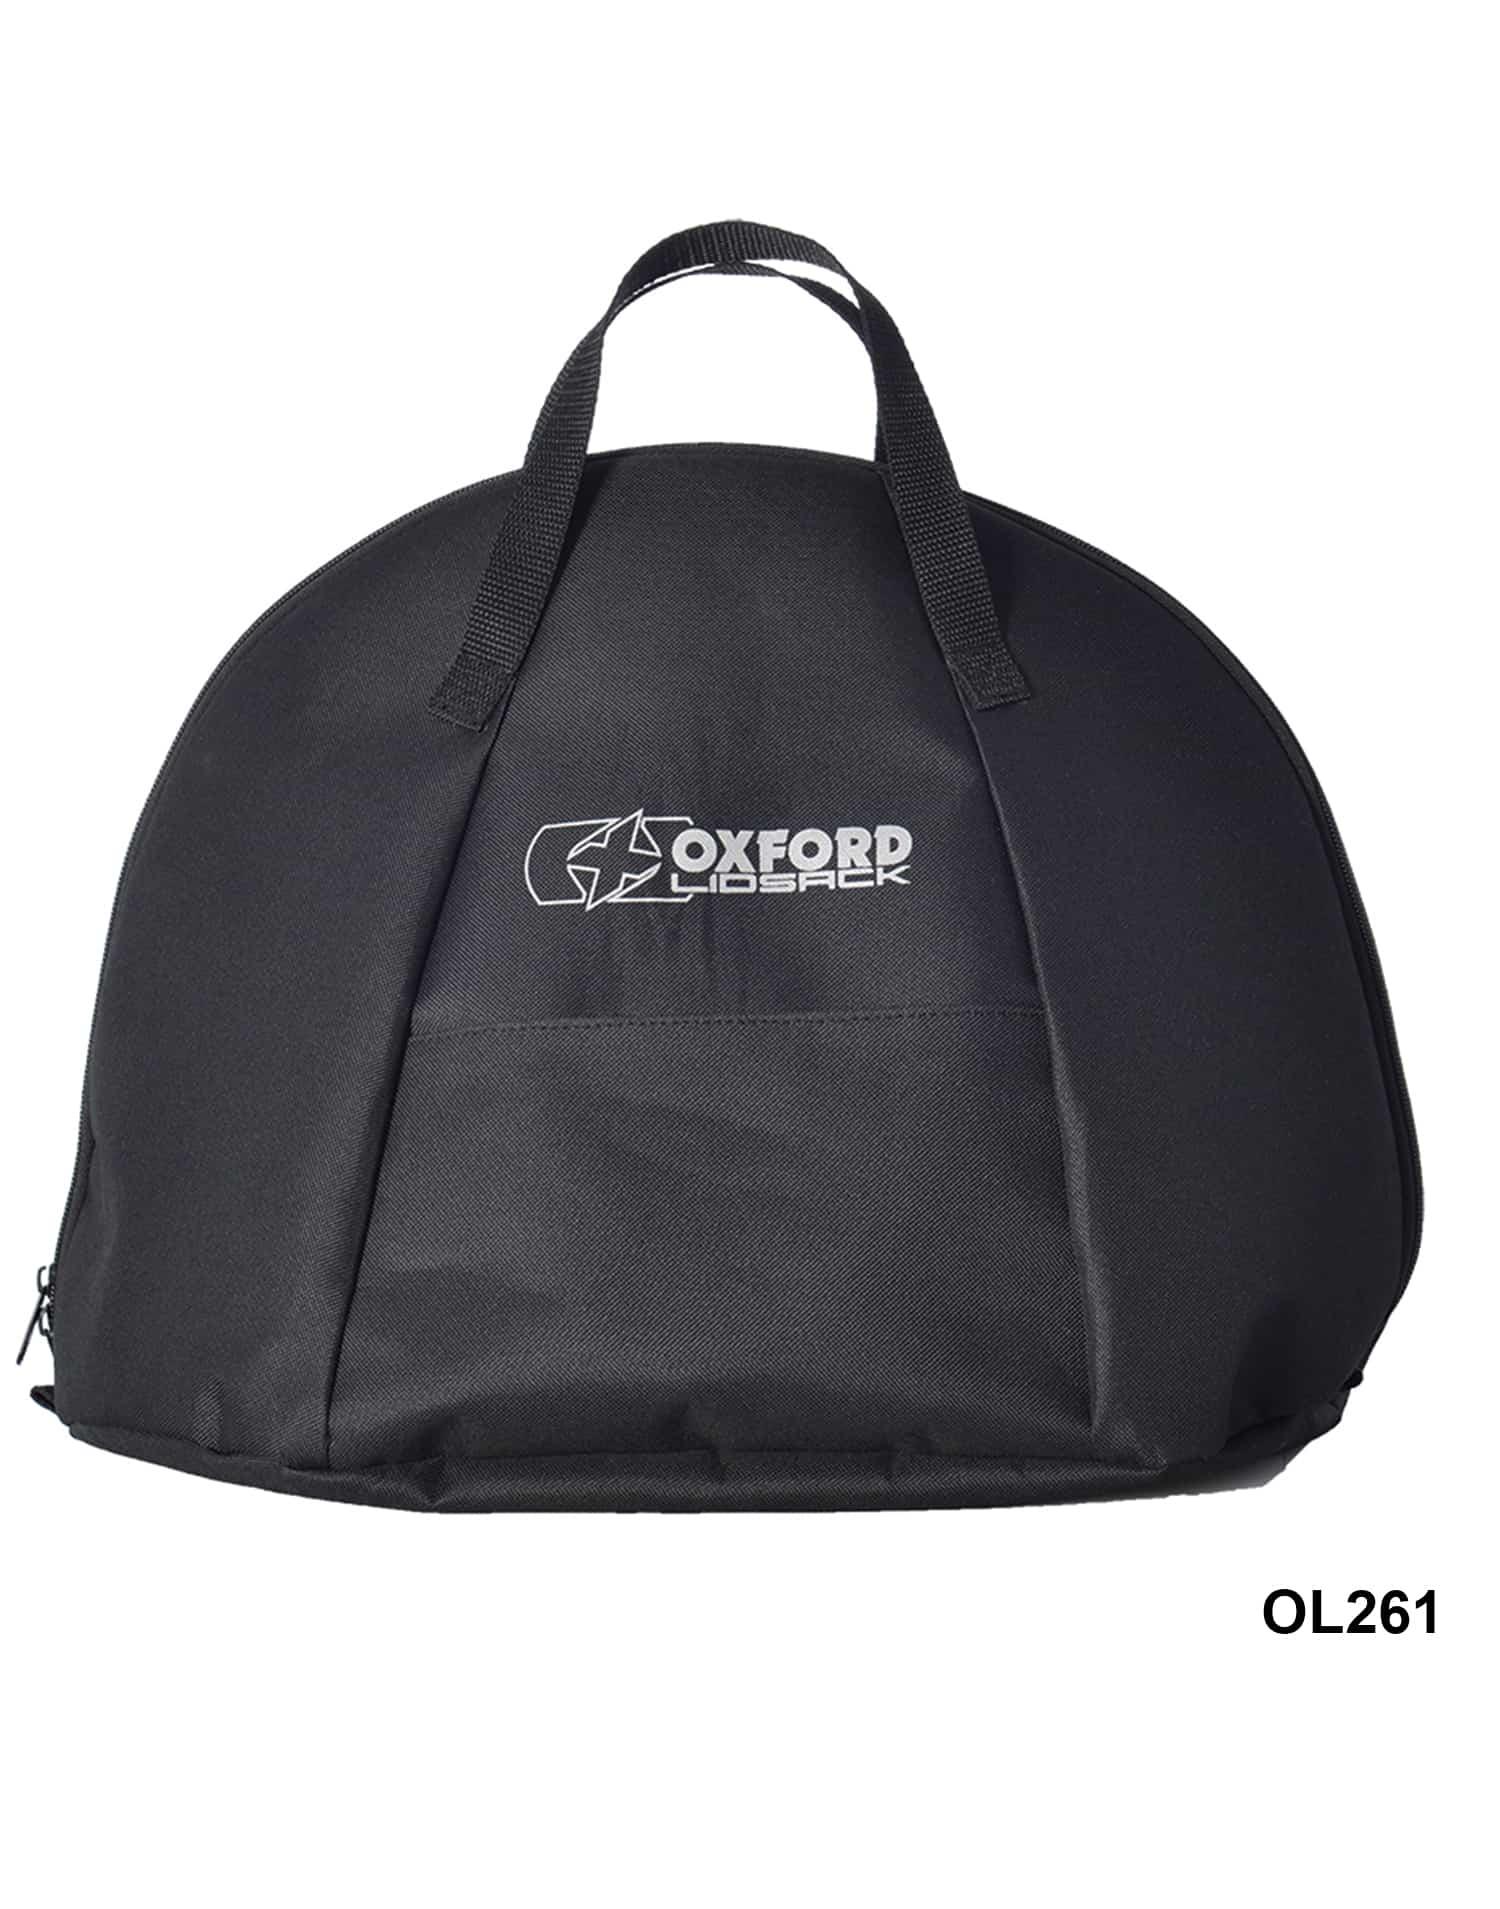 a5783c604c Oxford Products LidSack Helmet Bag - OL261